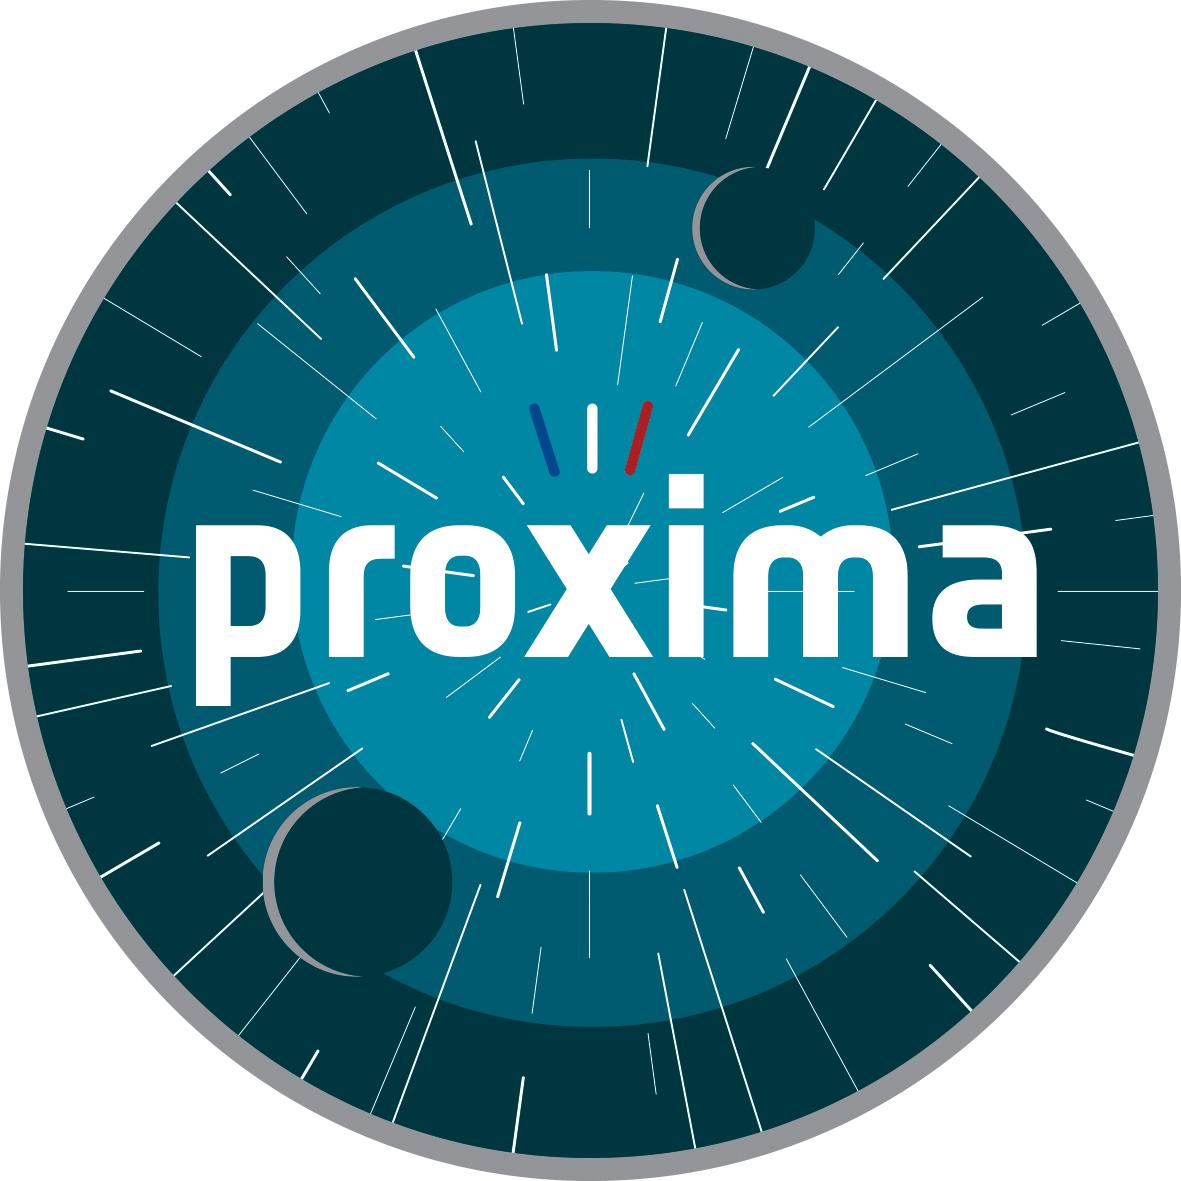 prx_proxima_mission_logo.jpg